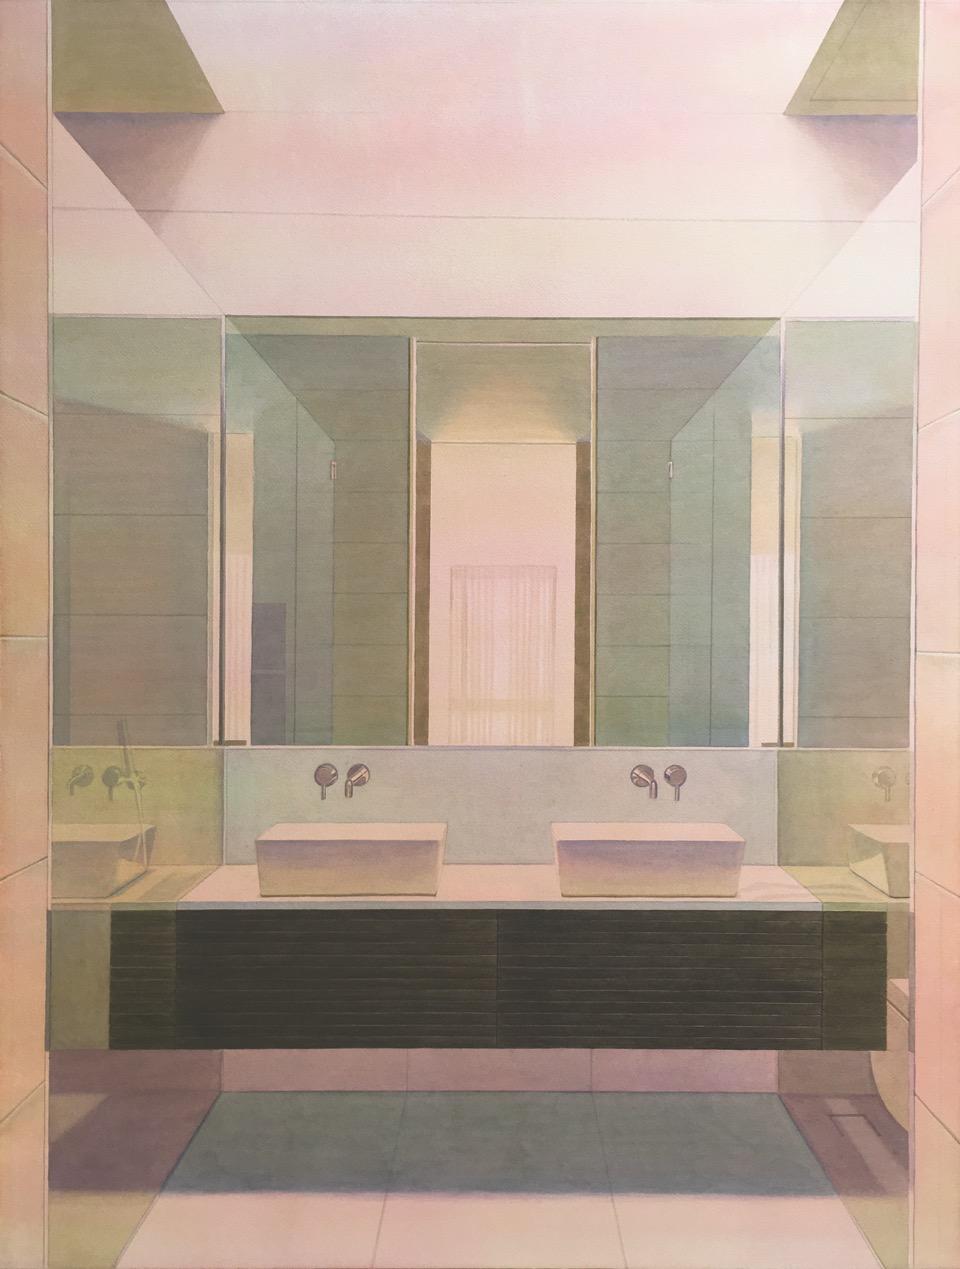 "Tristram Lansdowne,  Vanity , 2017, watercolour on paper in artist made frame,40"" x 30"" (102 x 76 cm)."